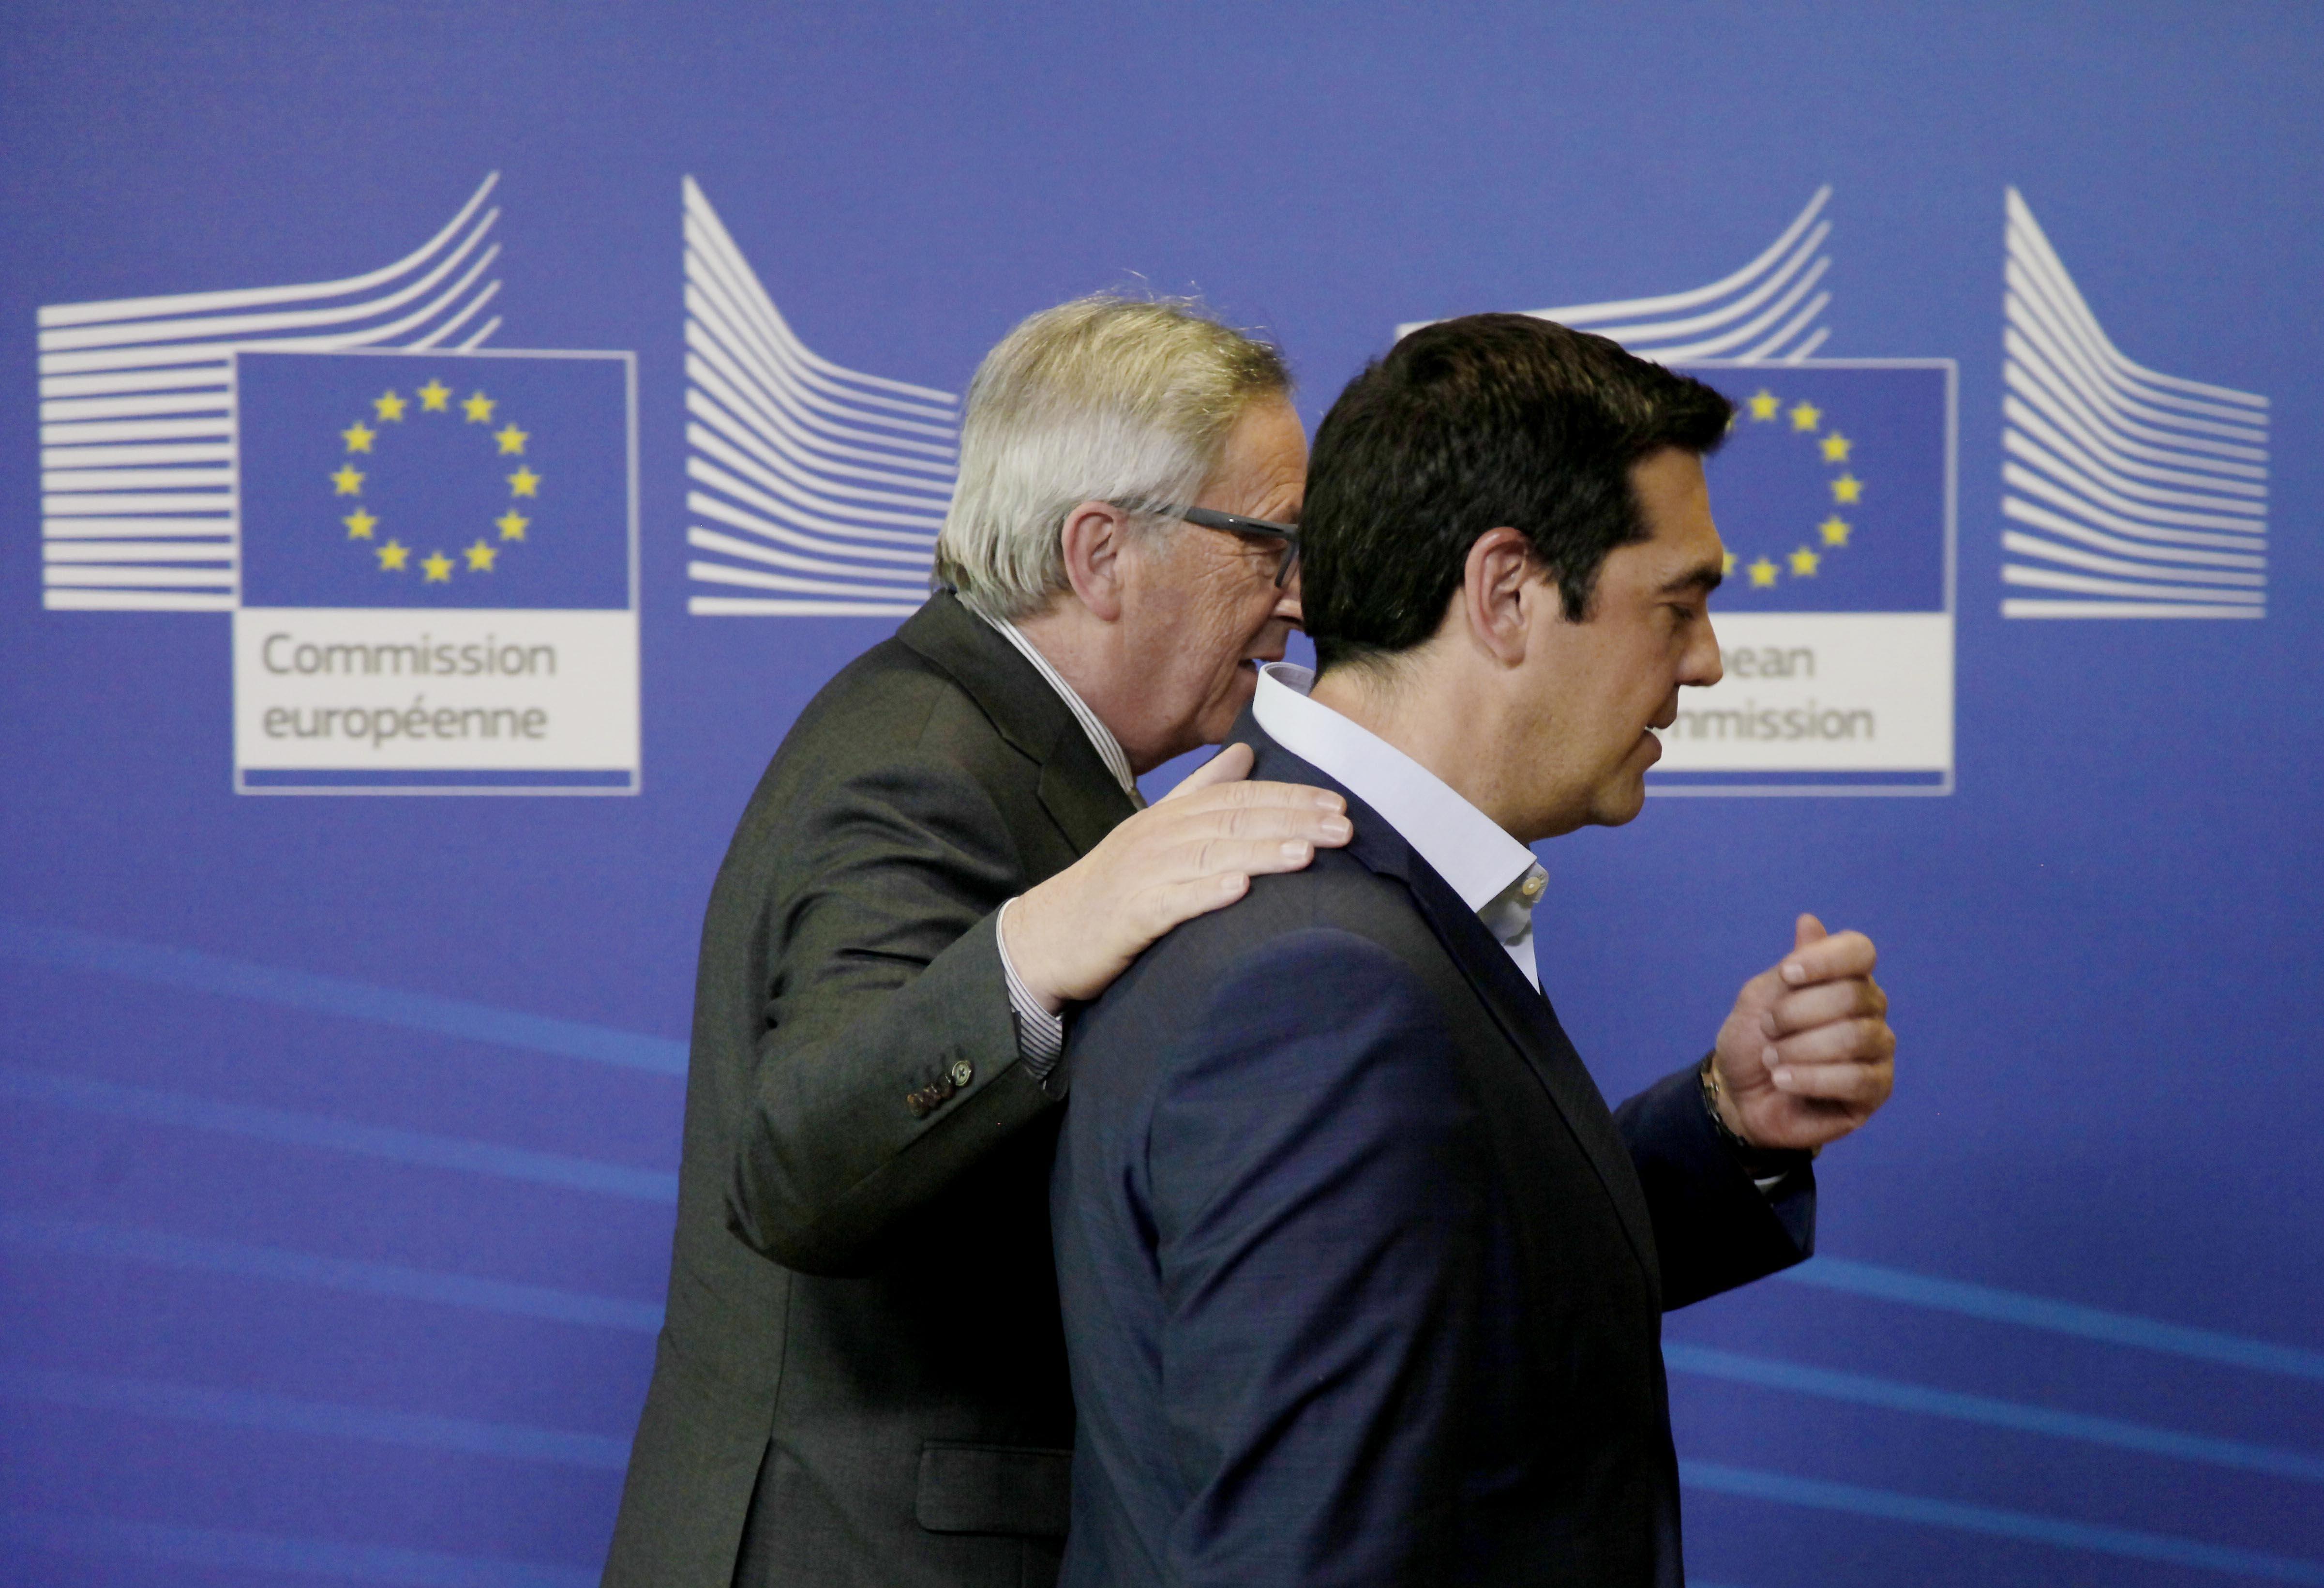 Grecia: Eurosummit apre strada verso accordo, mercoledì Eurogruppo